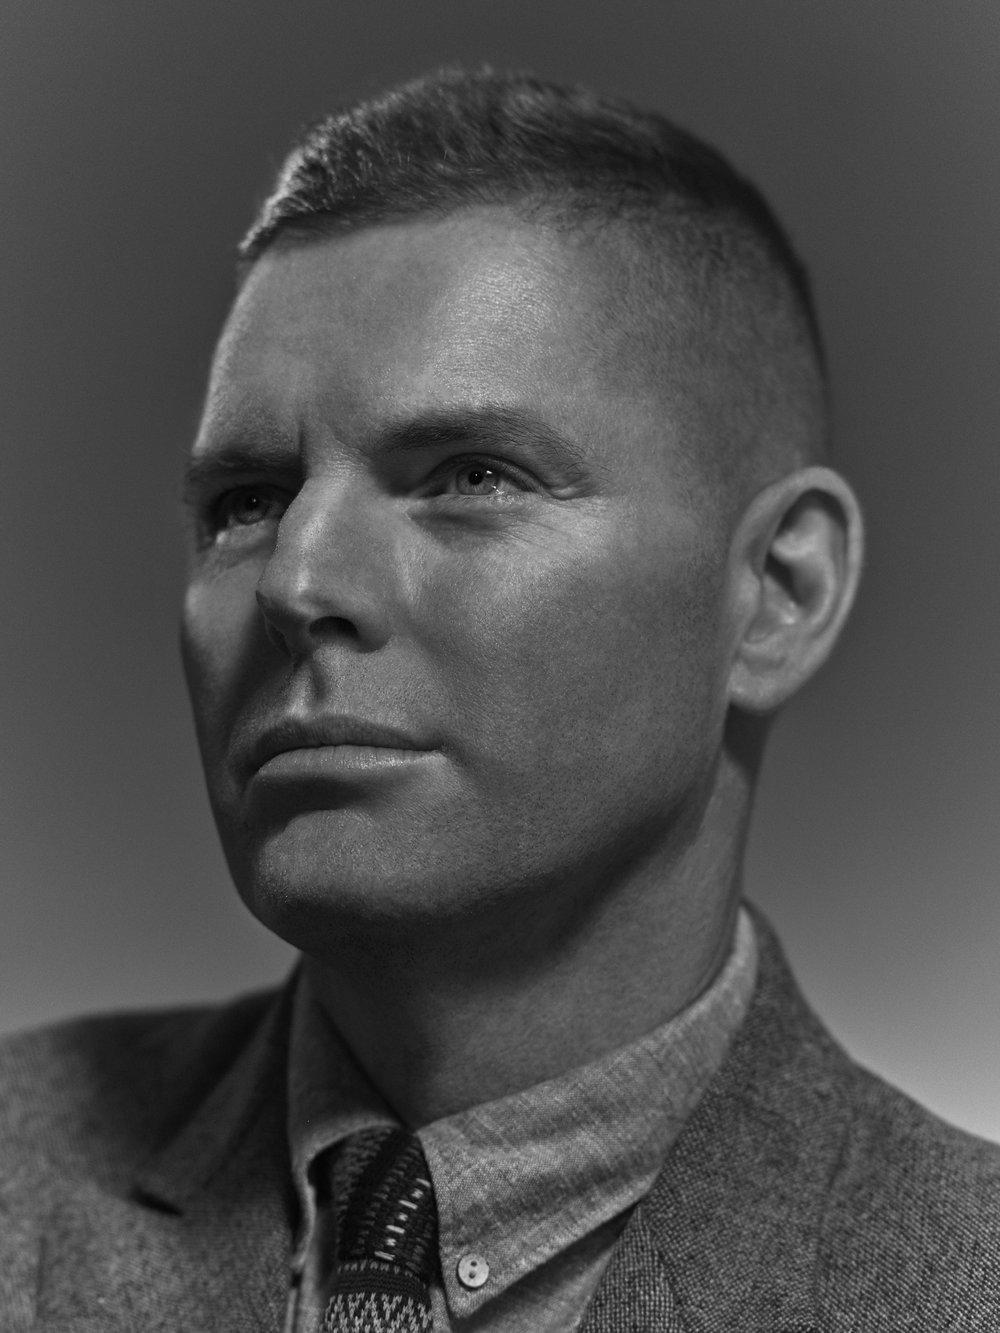 Douglas Hand